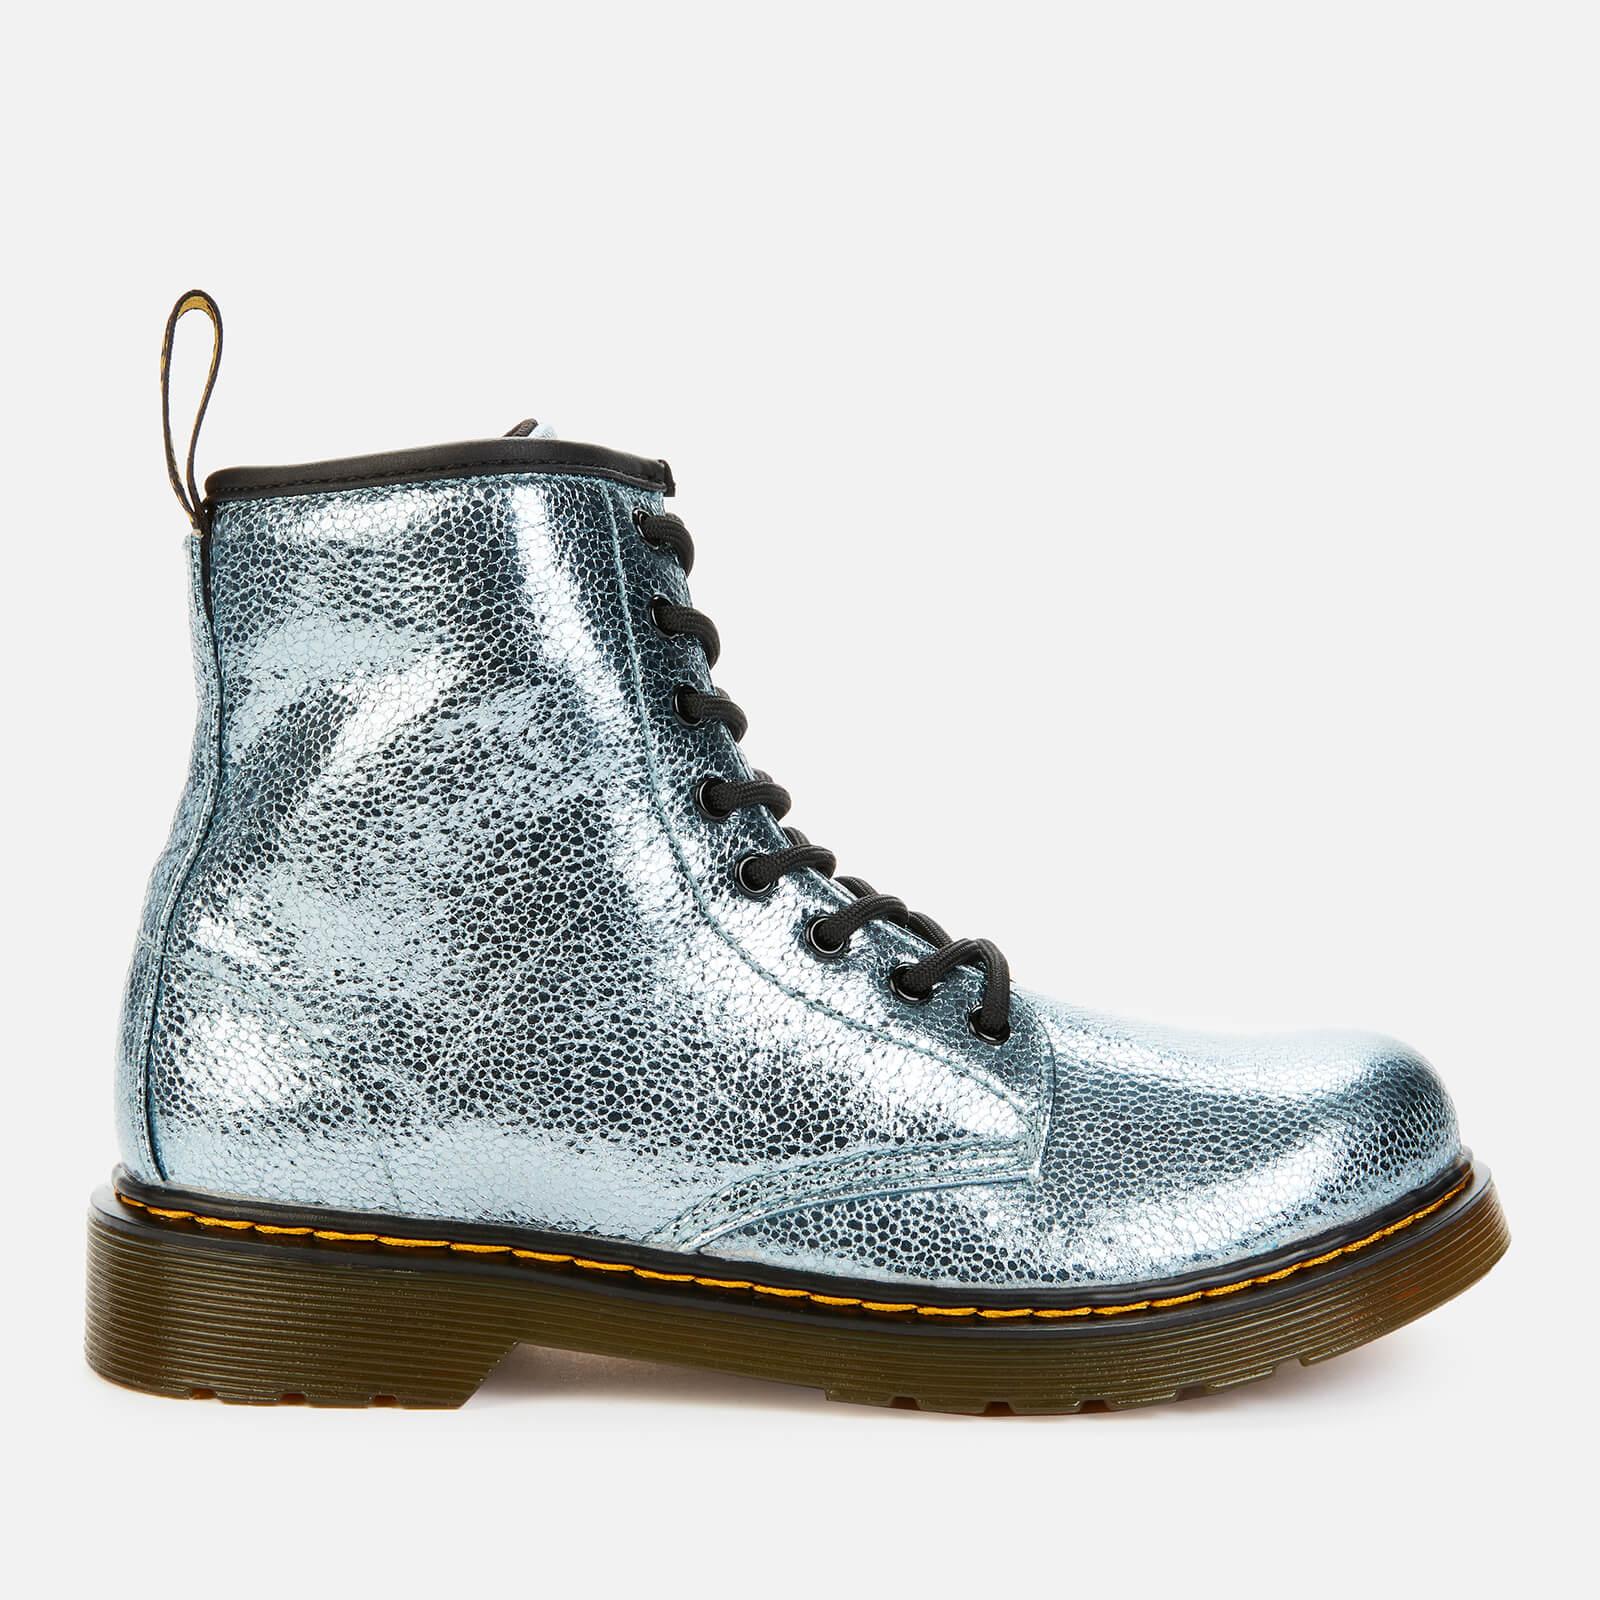 Dr. Martens Kids' 1460 Crinkle Metallic Lace-Up Boots - Teal - Uk 12 Kids